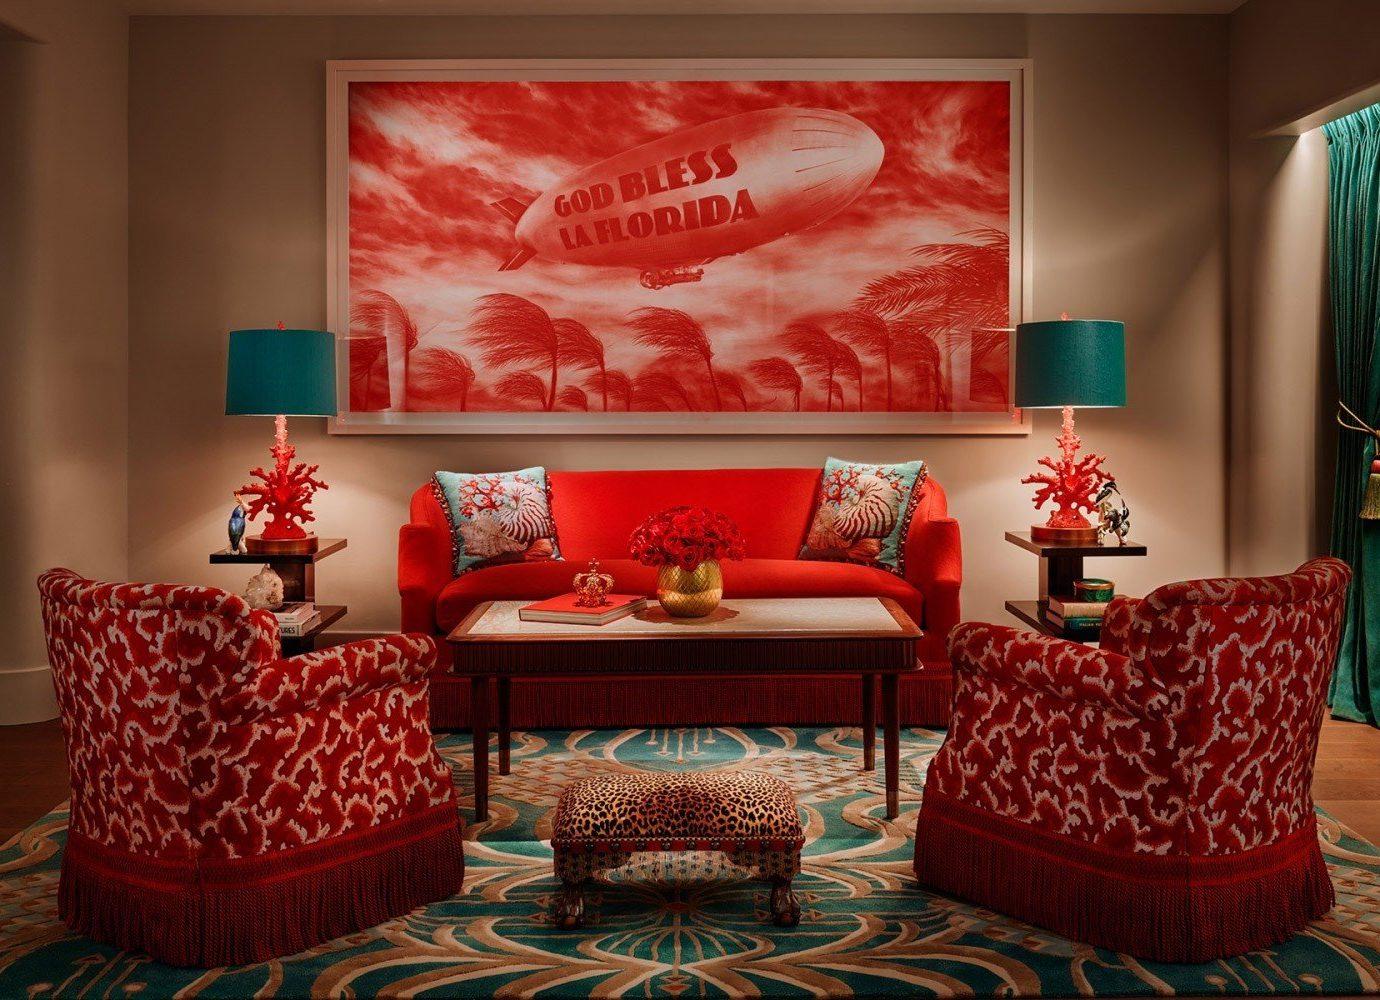 Hotels wall indoor room living room red Living interior design modern art home Design bed sheet Suite area decorated furniture